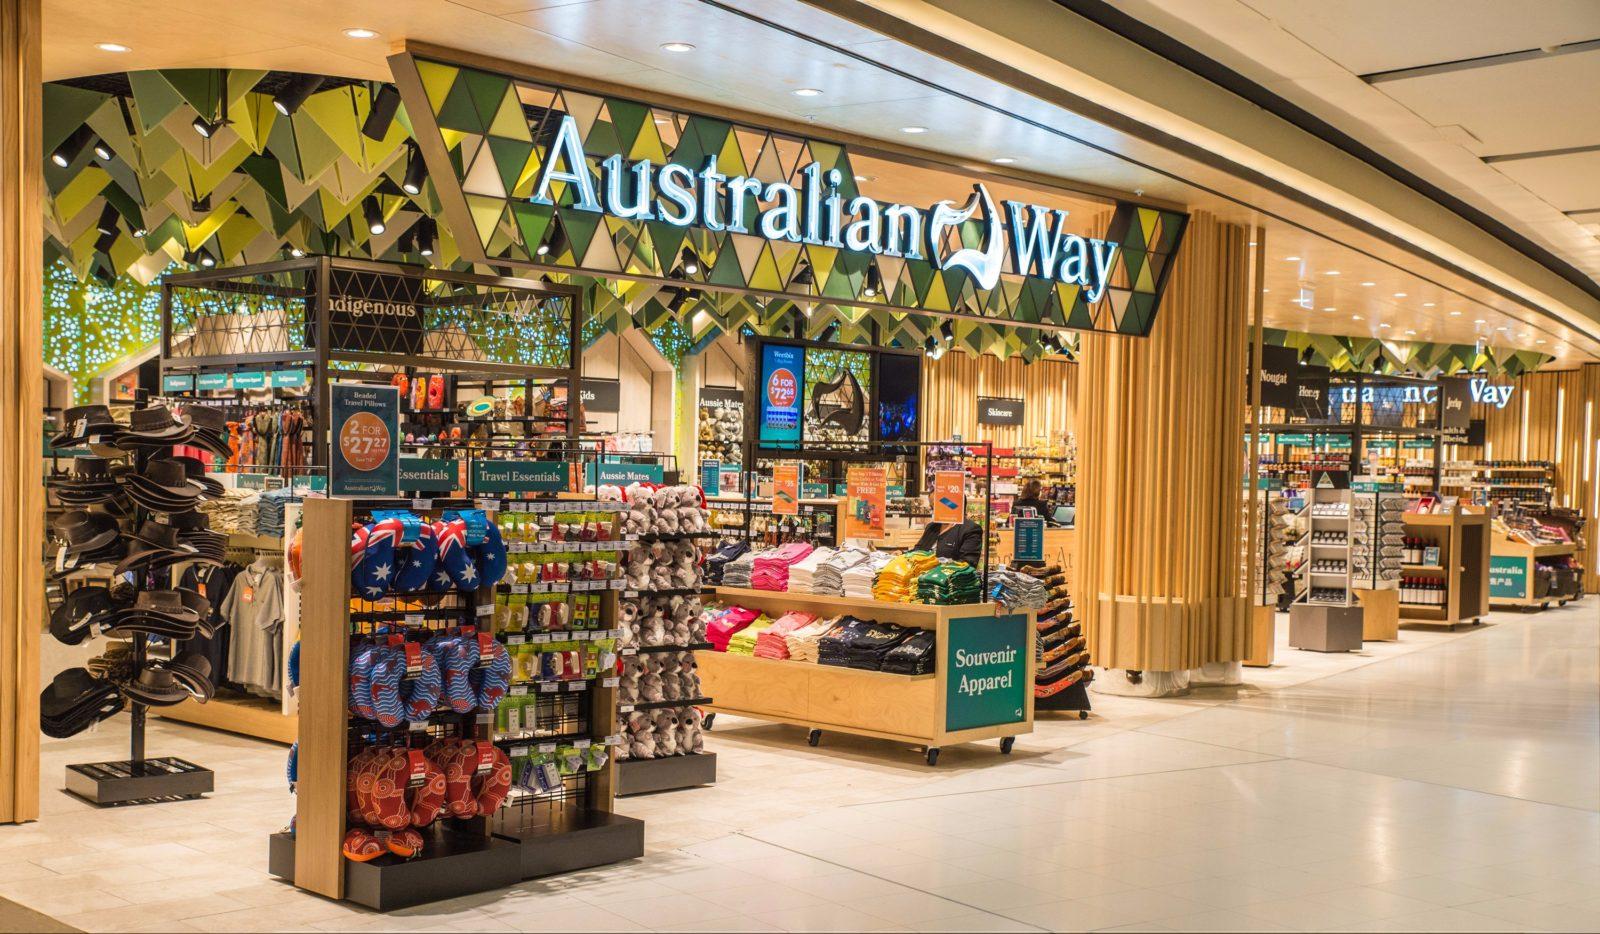 Australian Way Souvenirs Australian Made Gifts Sydney Airport